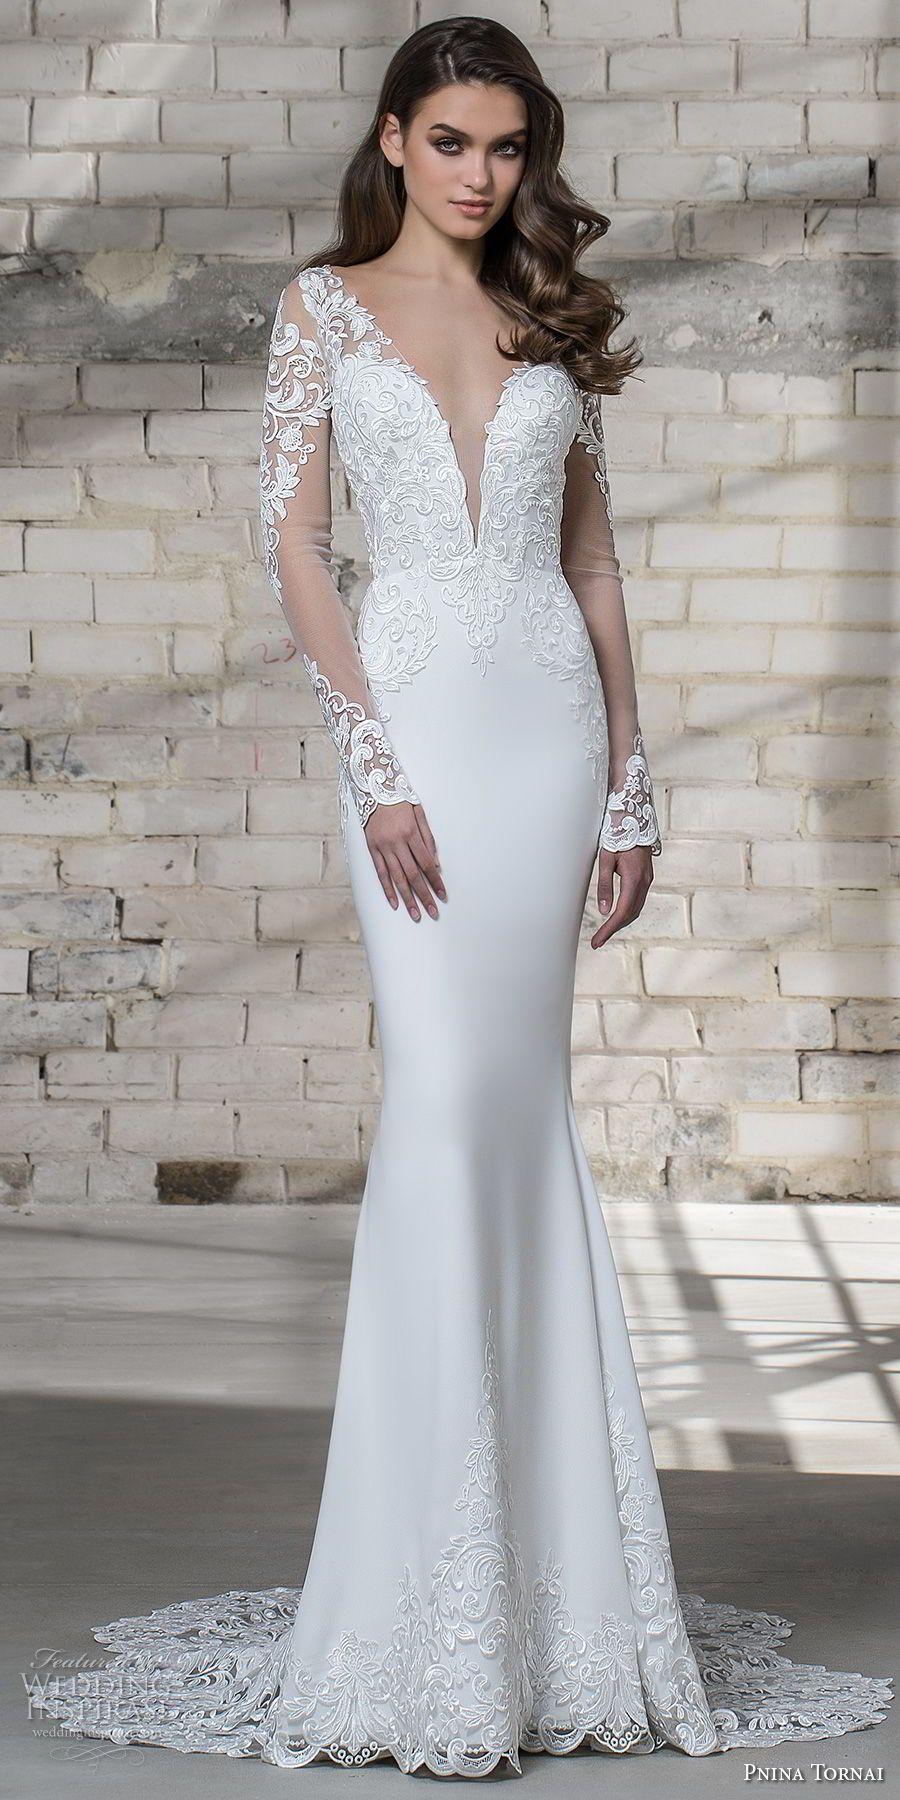 Pnina Tornai 2019 Love Bridal Long Sleeves Deep Plunging V Neck Heavily Embellished Pnina Tornai Wedding Dress Sheath Wedding Dress Lace Elegant Wedding Dress [ 1800 x 900 Pixel ]